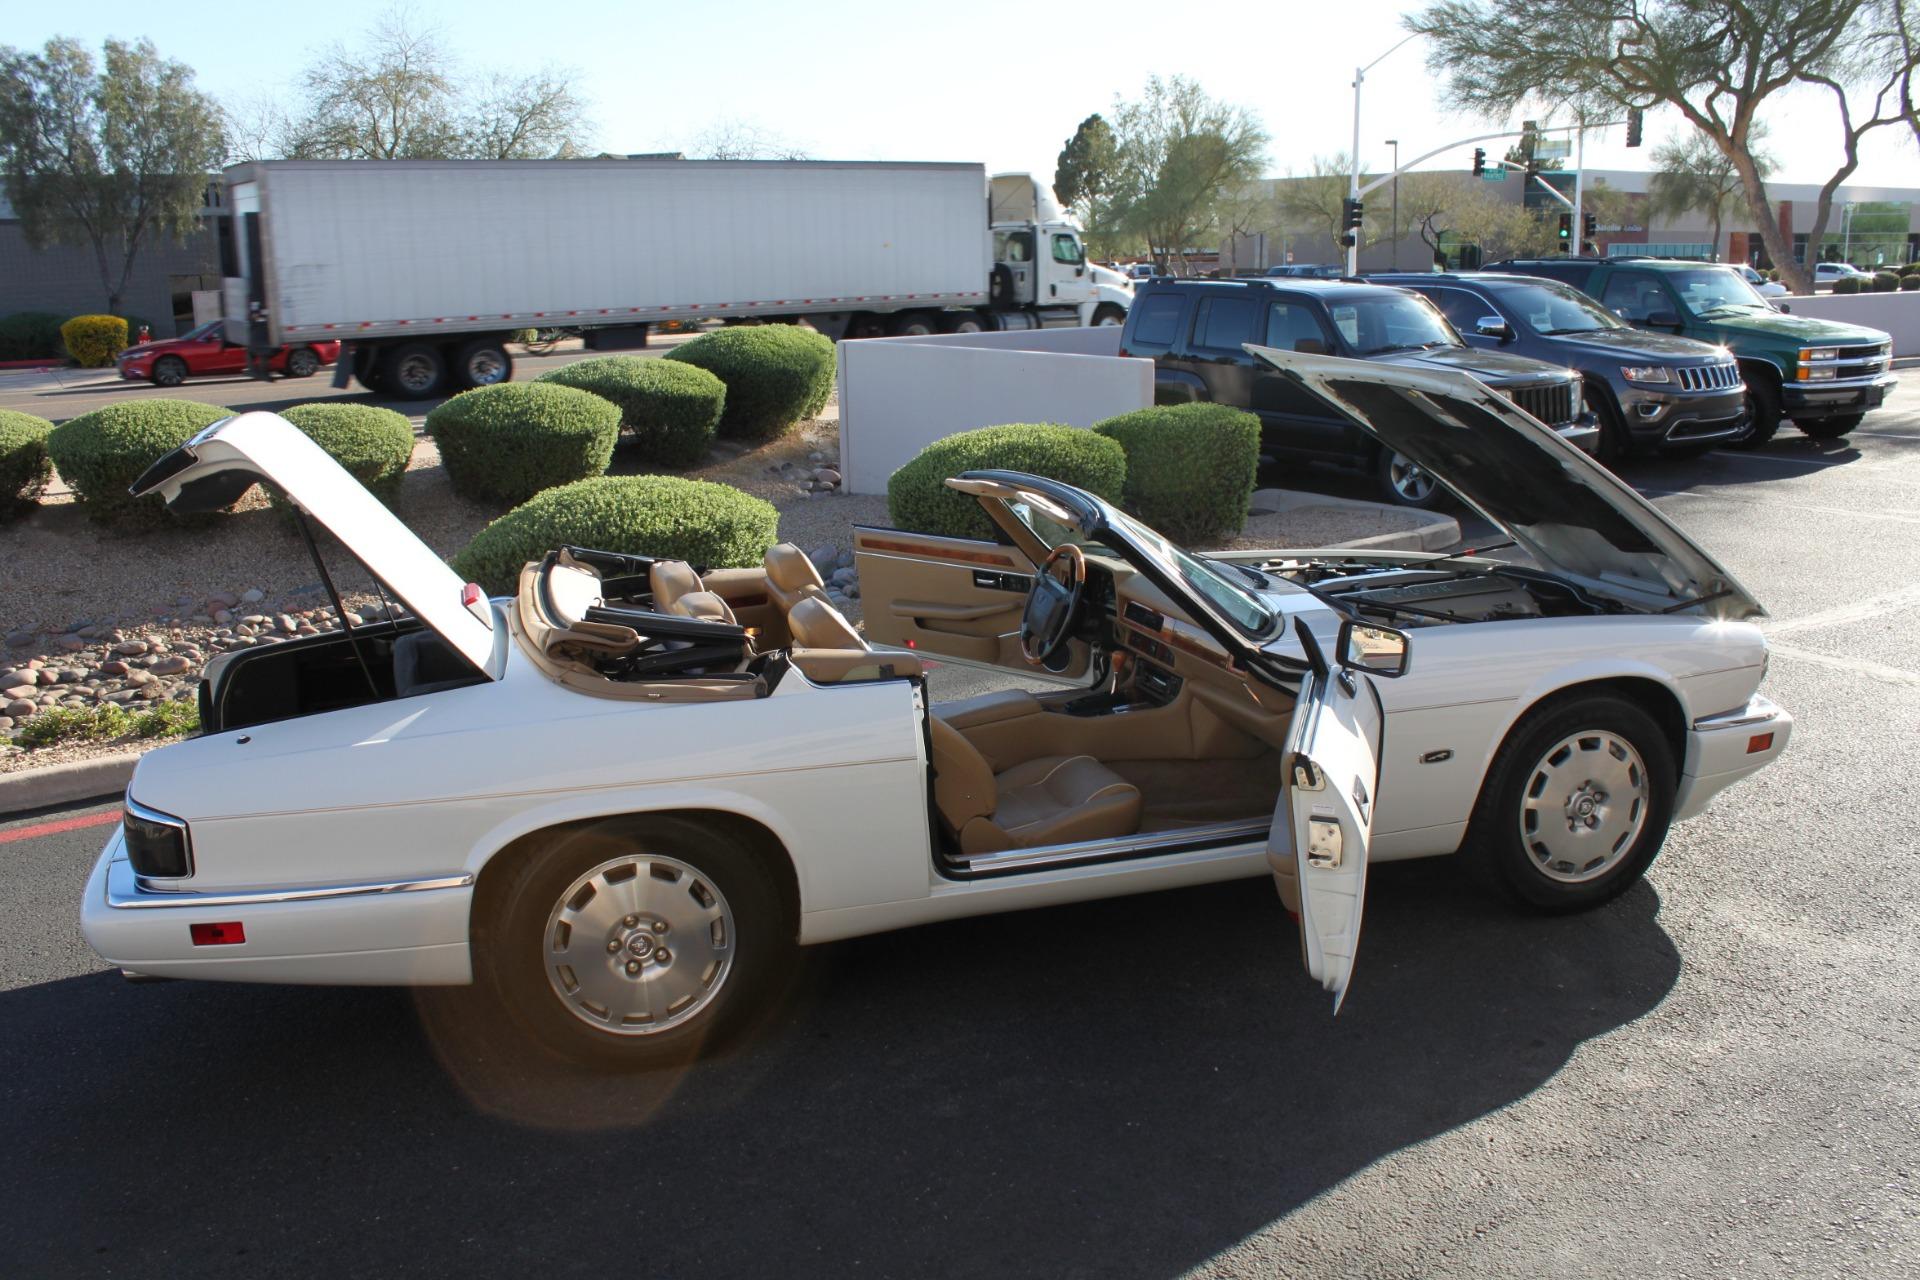 Used-1996-Jaguar-XJS-Convertible-Toyota